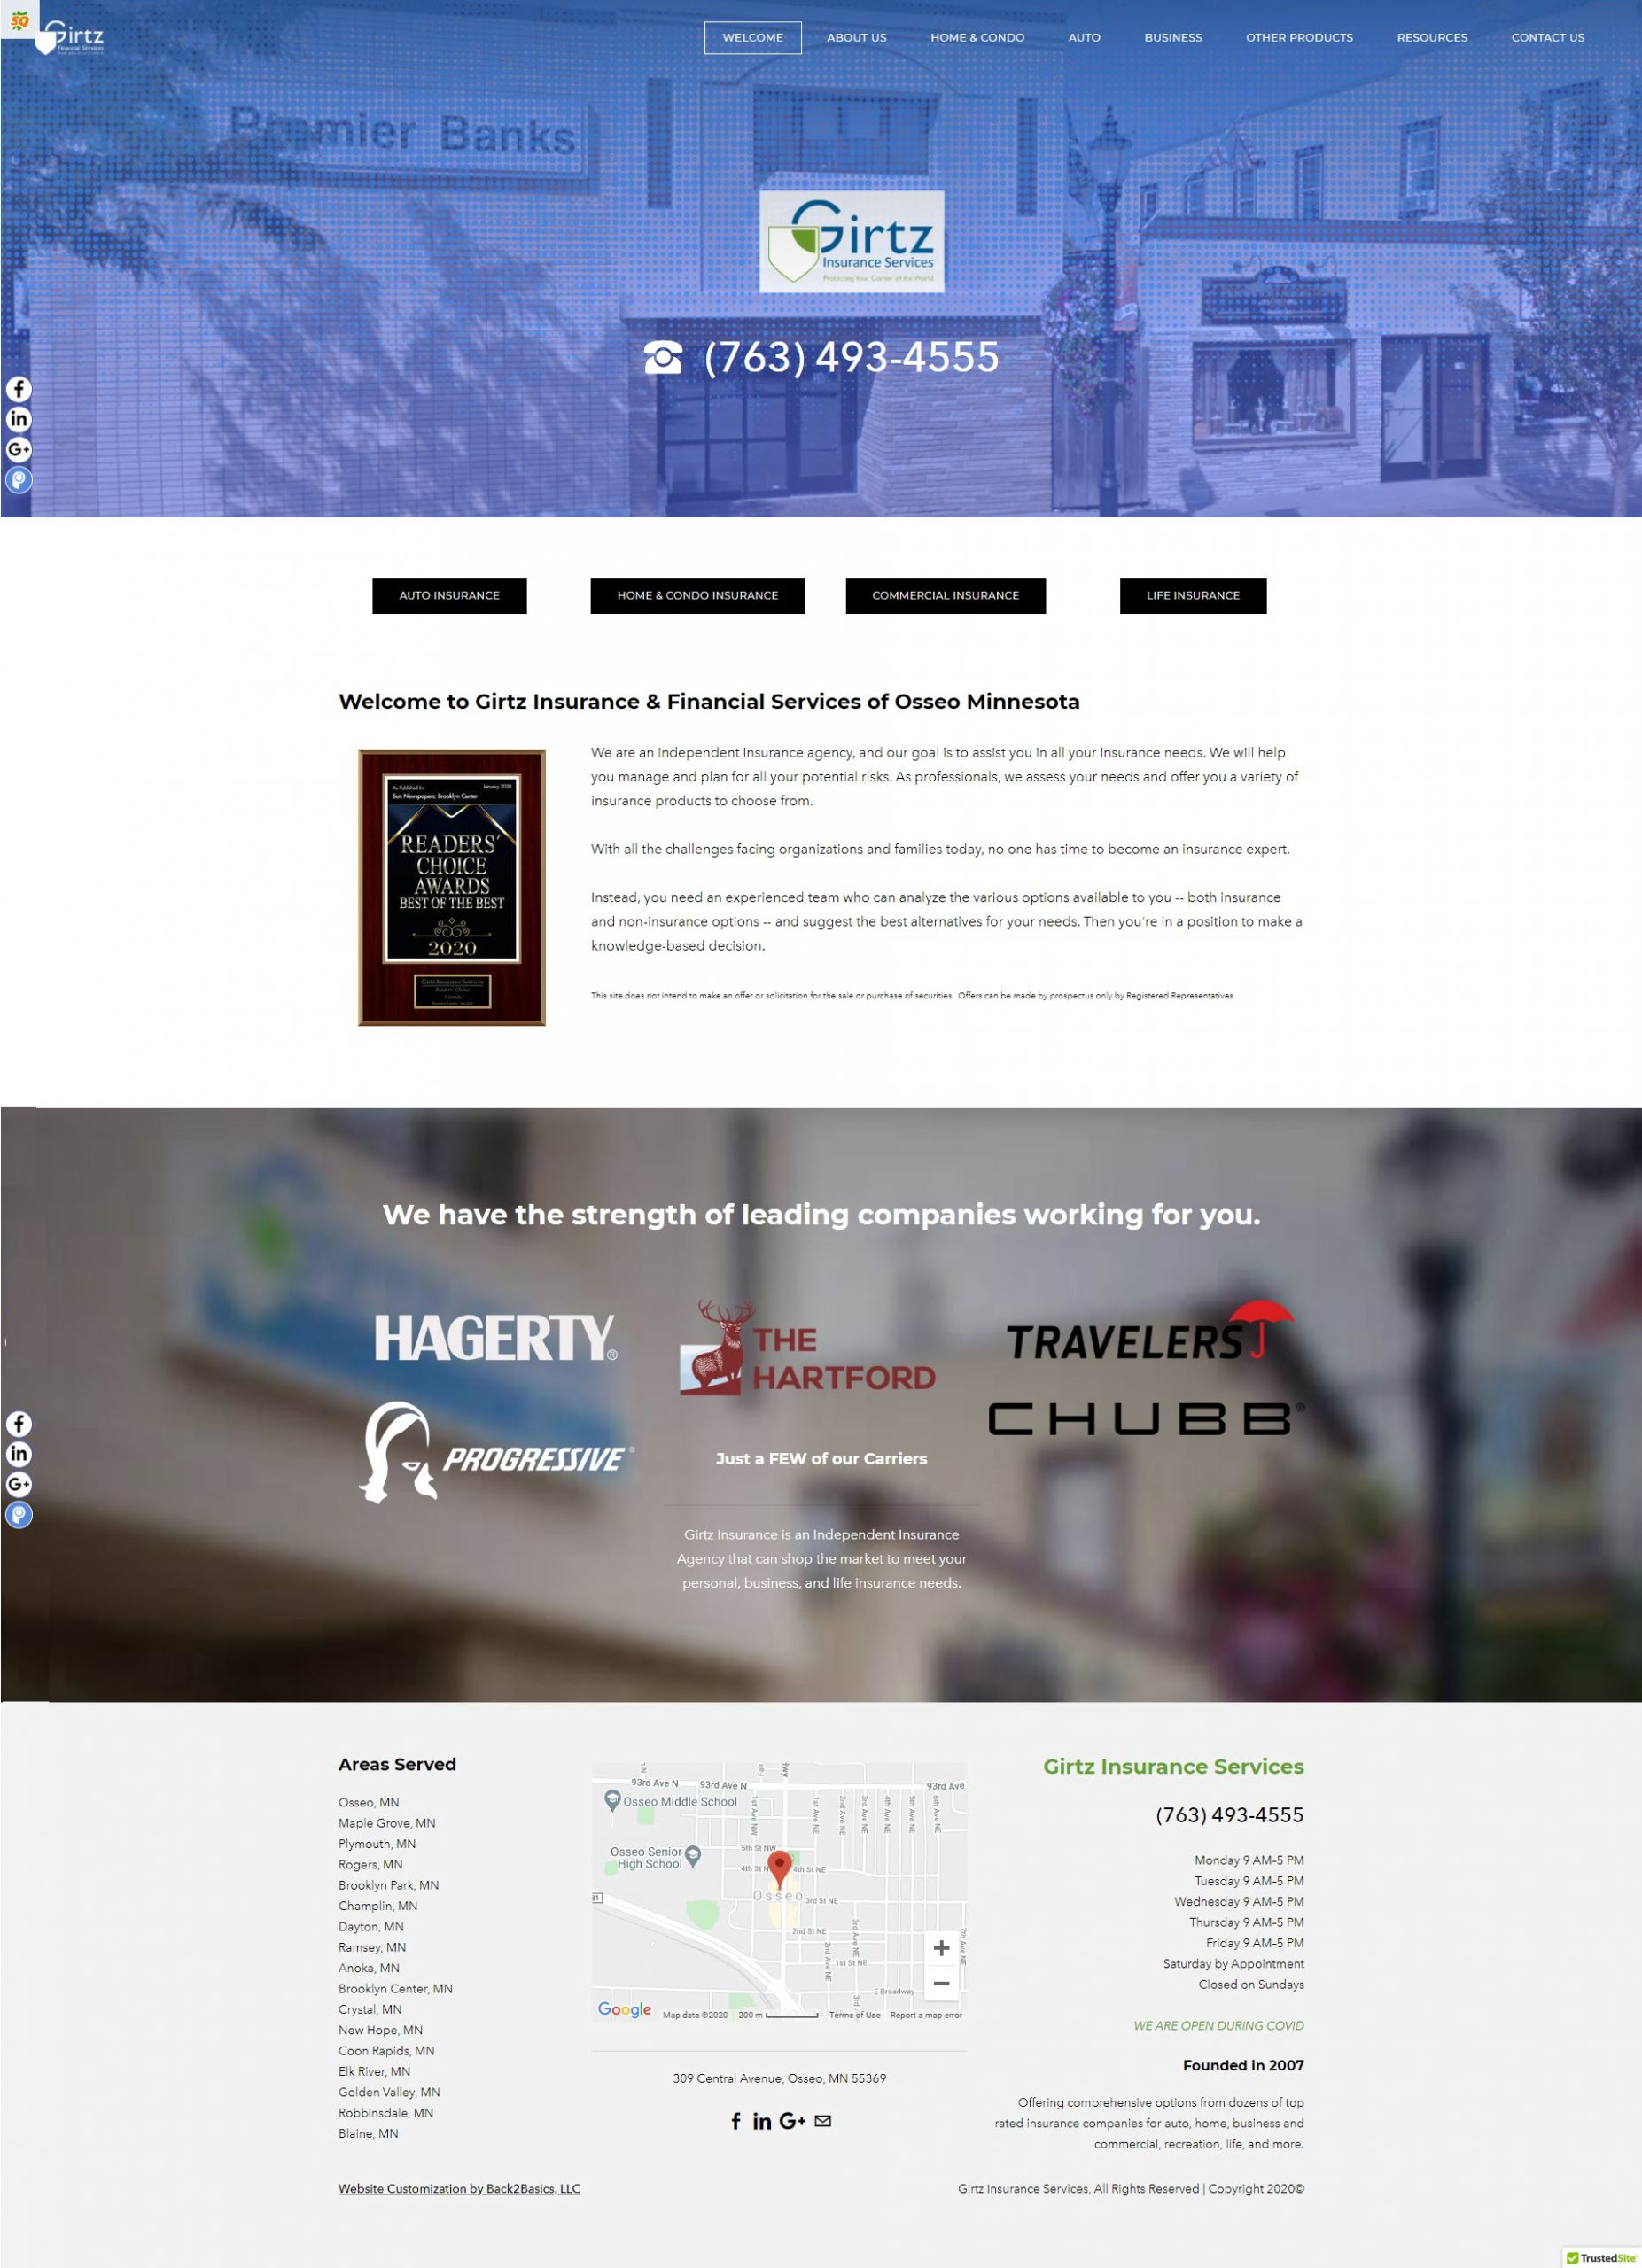 Girtz Insurance Website Home page - after design